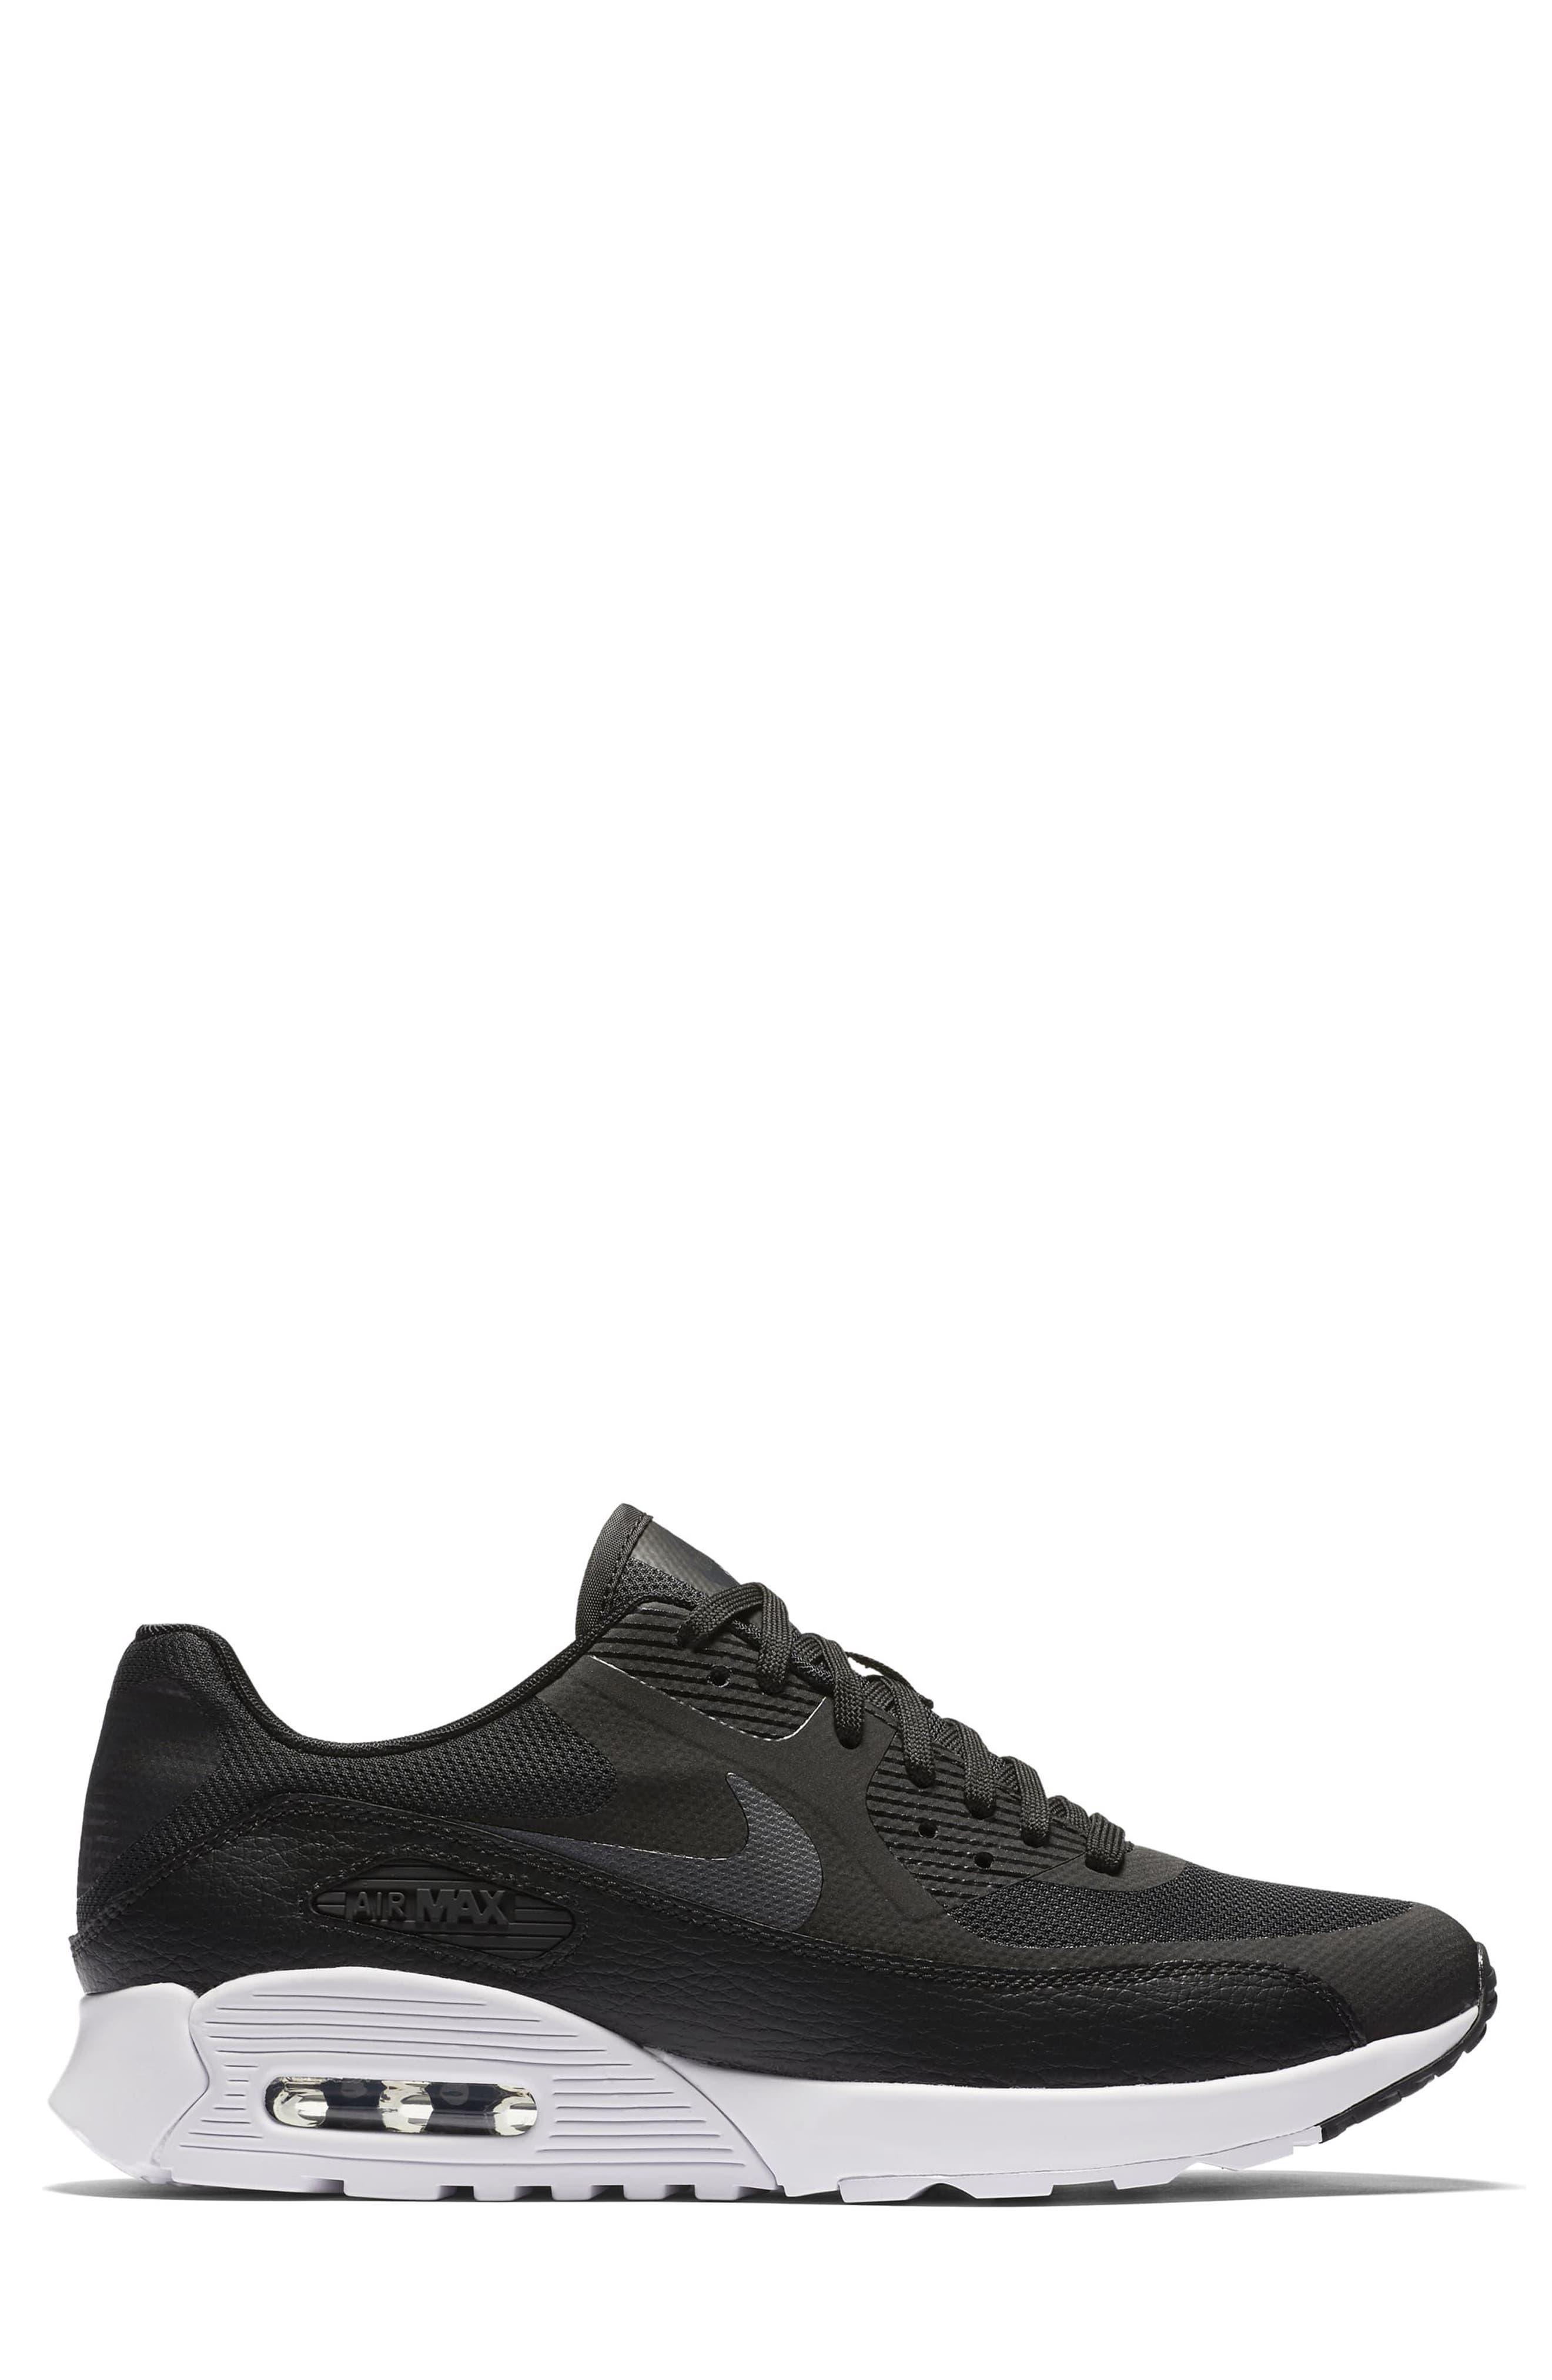 Air Max 90 Ultra 2.0 Sneaker,                             Alternate thumbnail 3, color,                             002